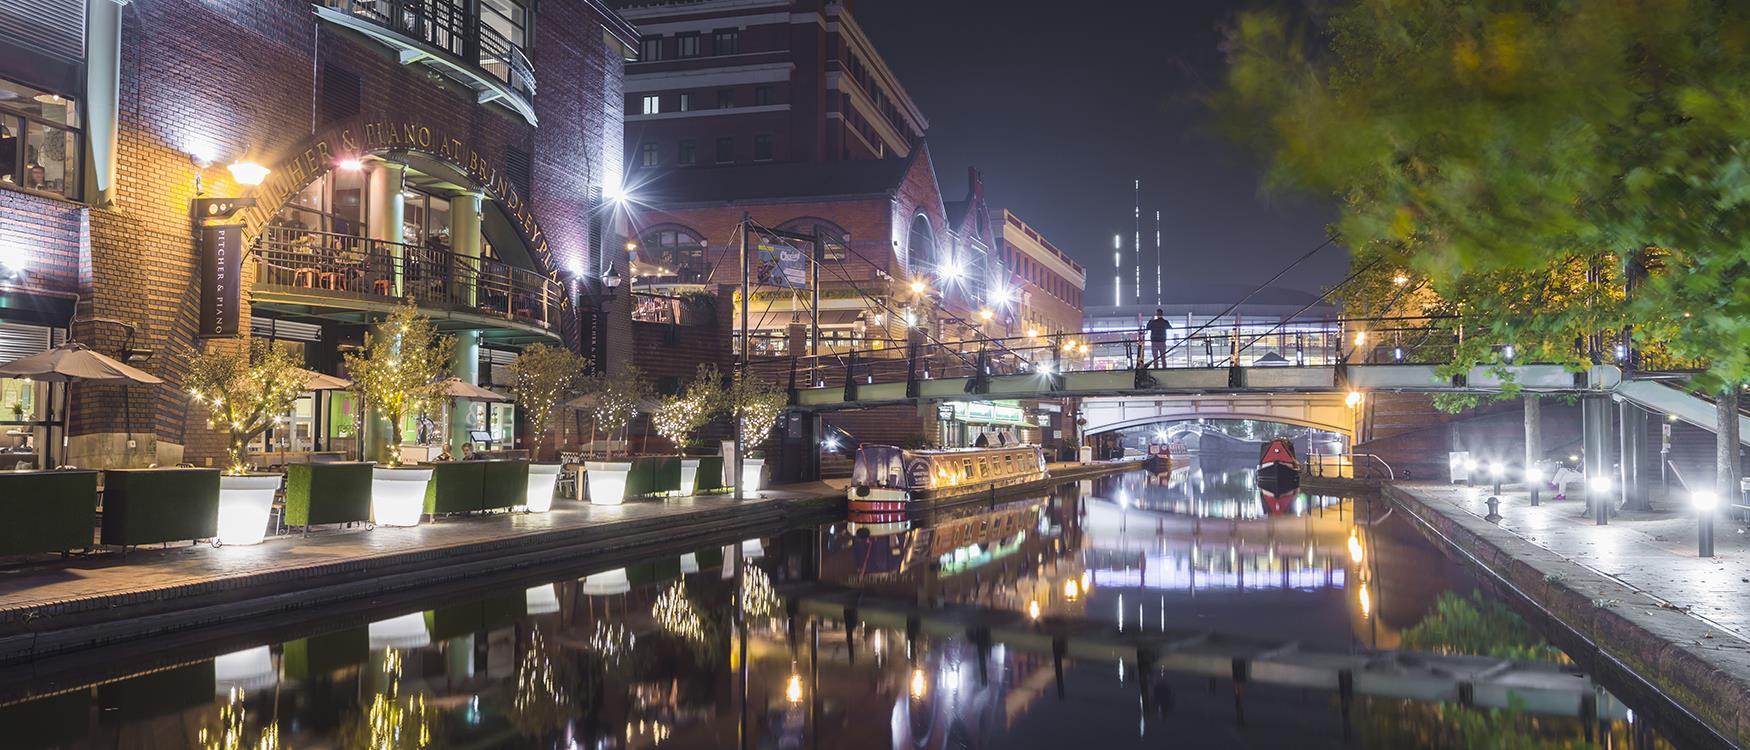 Explore the West Midlands